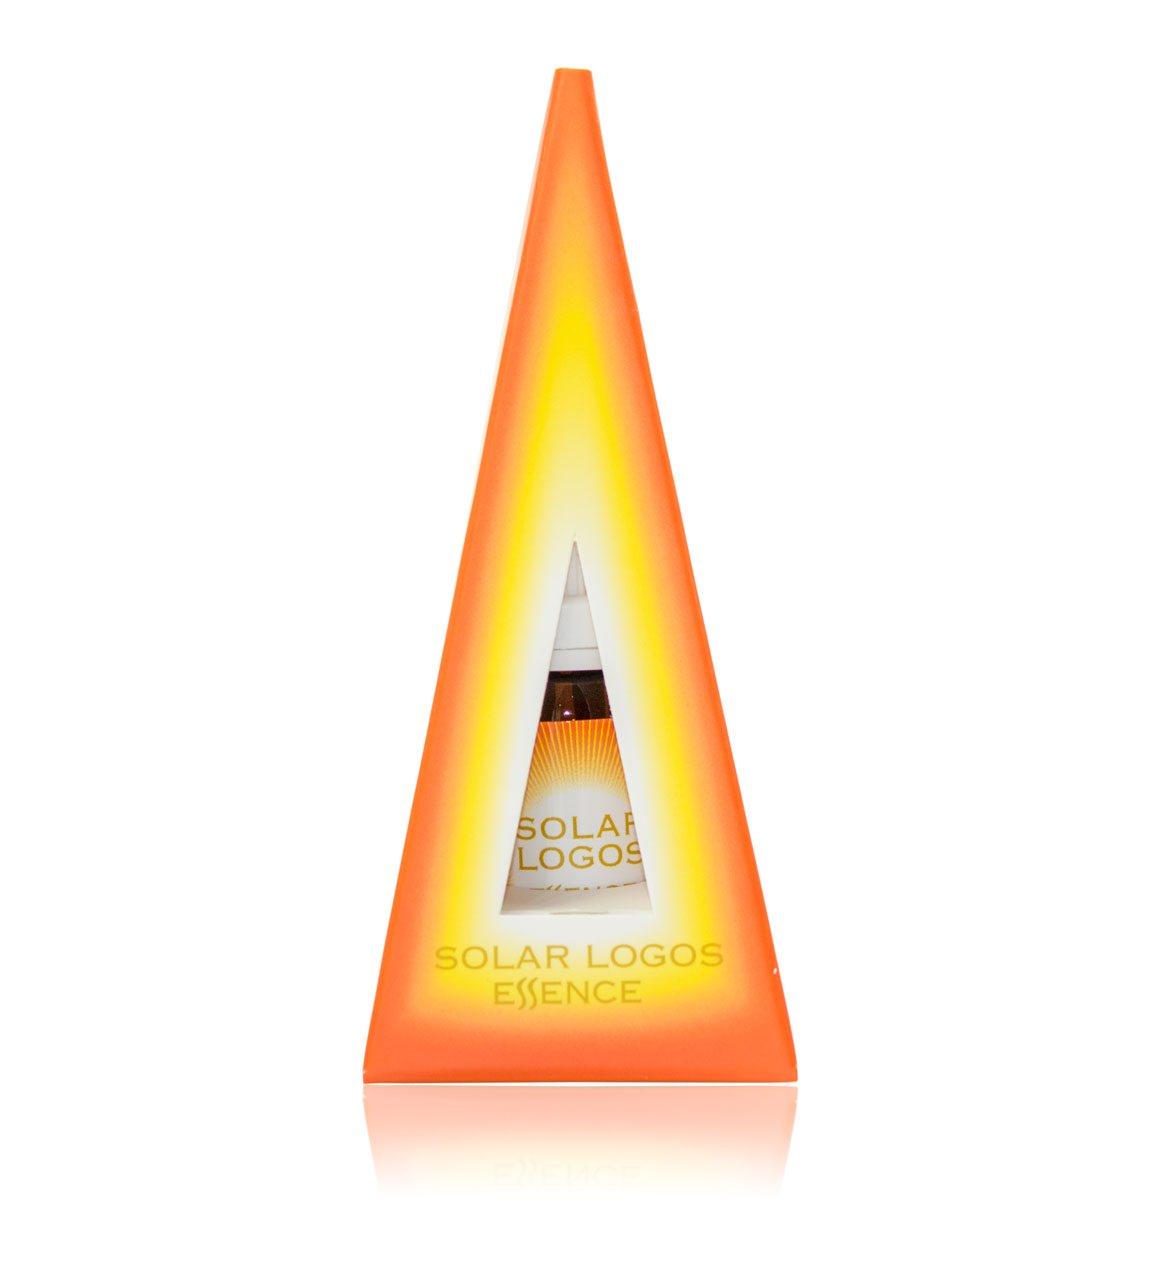 Solar Logos Essence